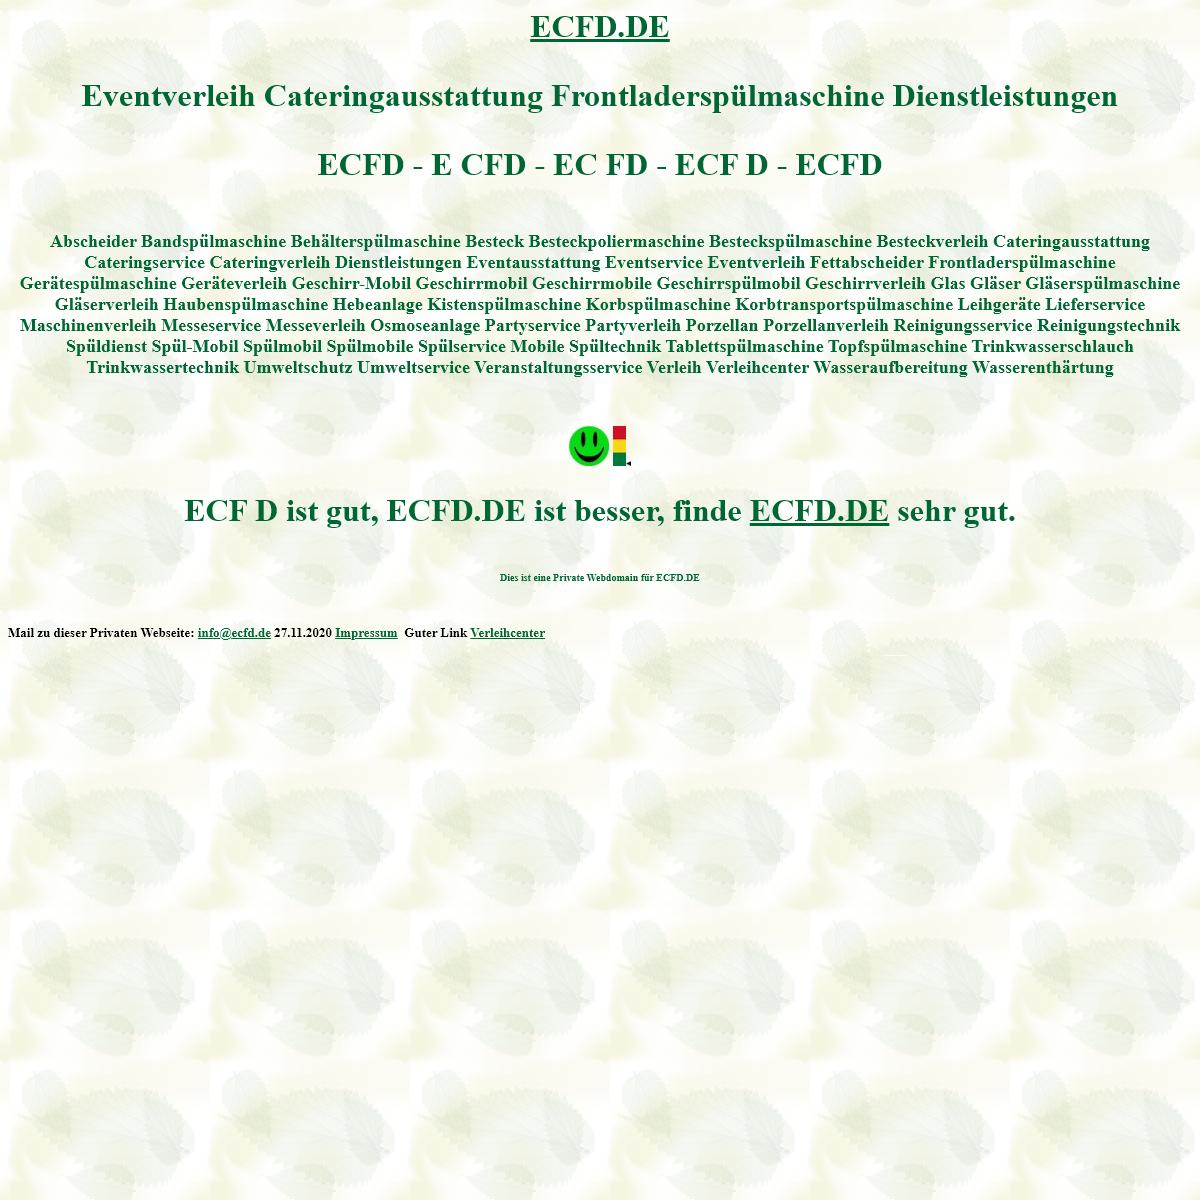 ecfd Eventverleih Cateringausstattung Frontladerspülmaschine Dienstleistungen Spülmobil Verleih Geschirrmobil Mieten